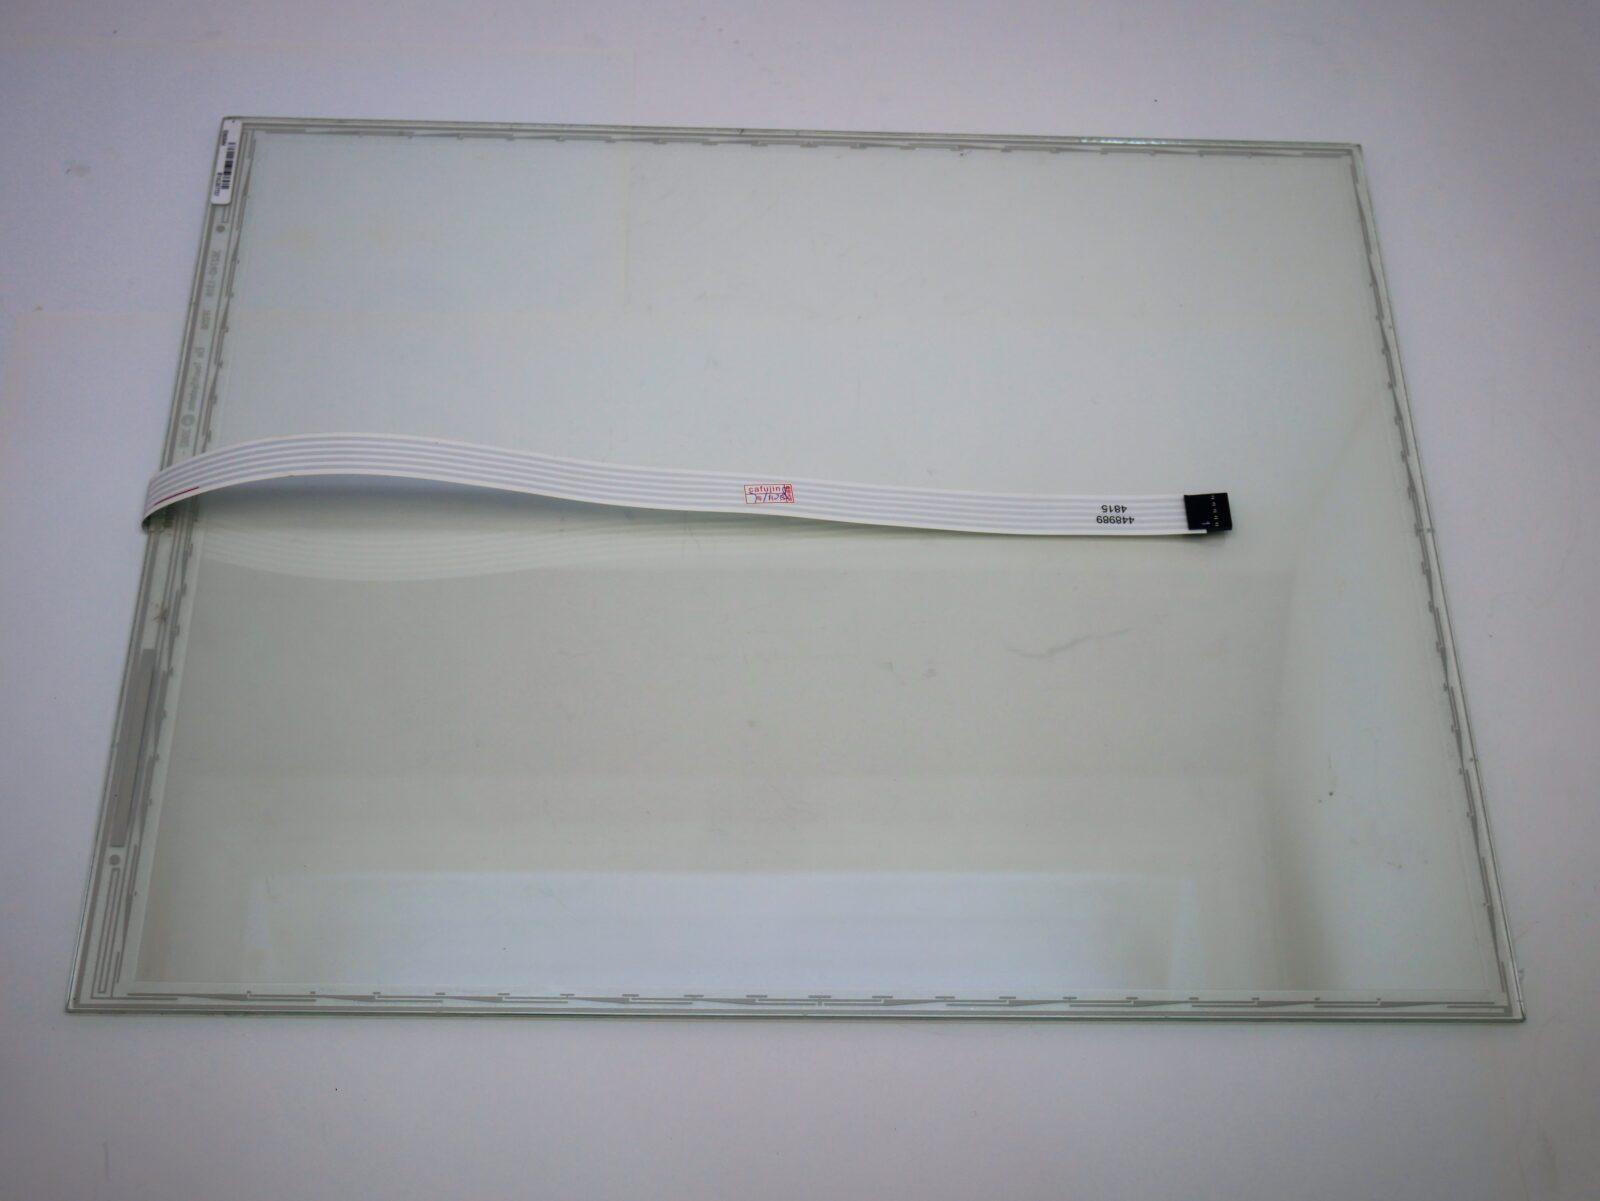 Touchscreen 406 x 323 x 3mm (19 inches) HDM: 00.783.0884